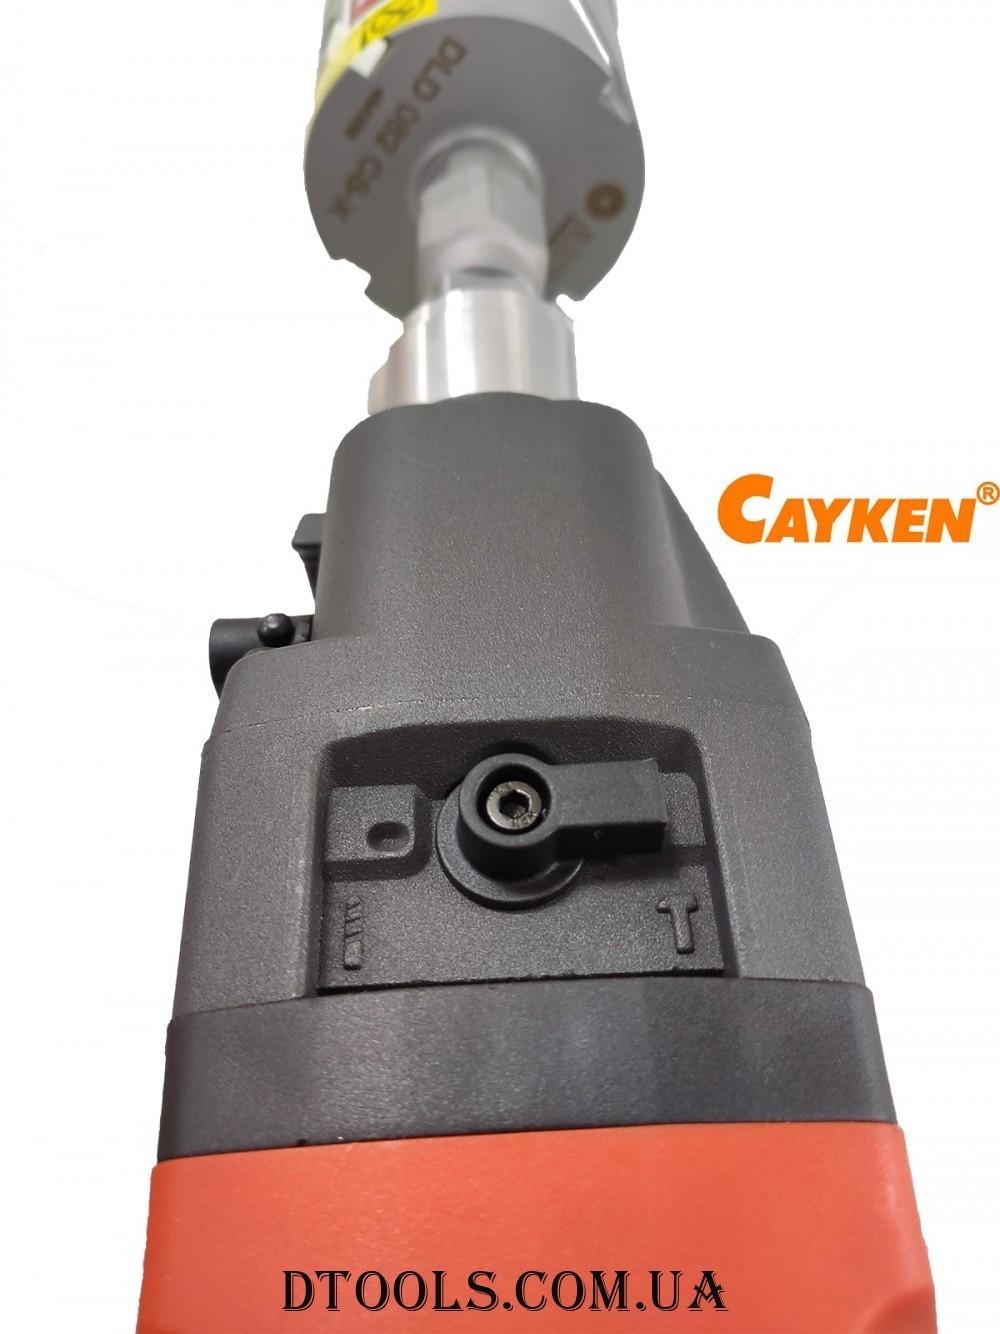 Установка алмазного бурения с микроударом Cayken SCY-18/2PA - 3